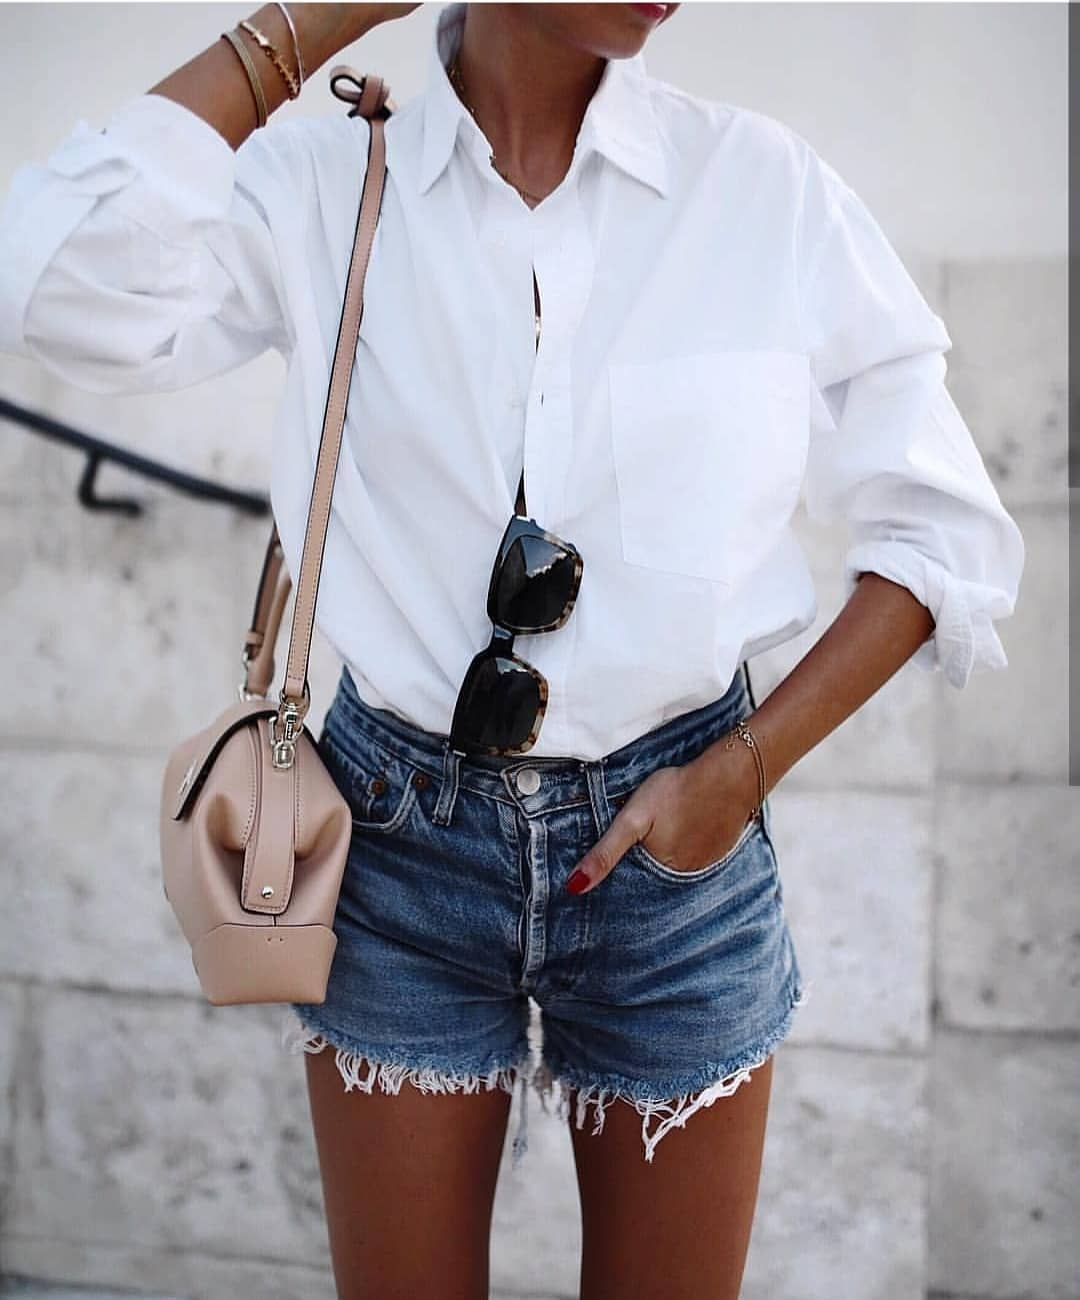 White Shirt And Blue Denim Shorts For Summer 2019